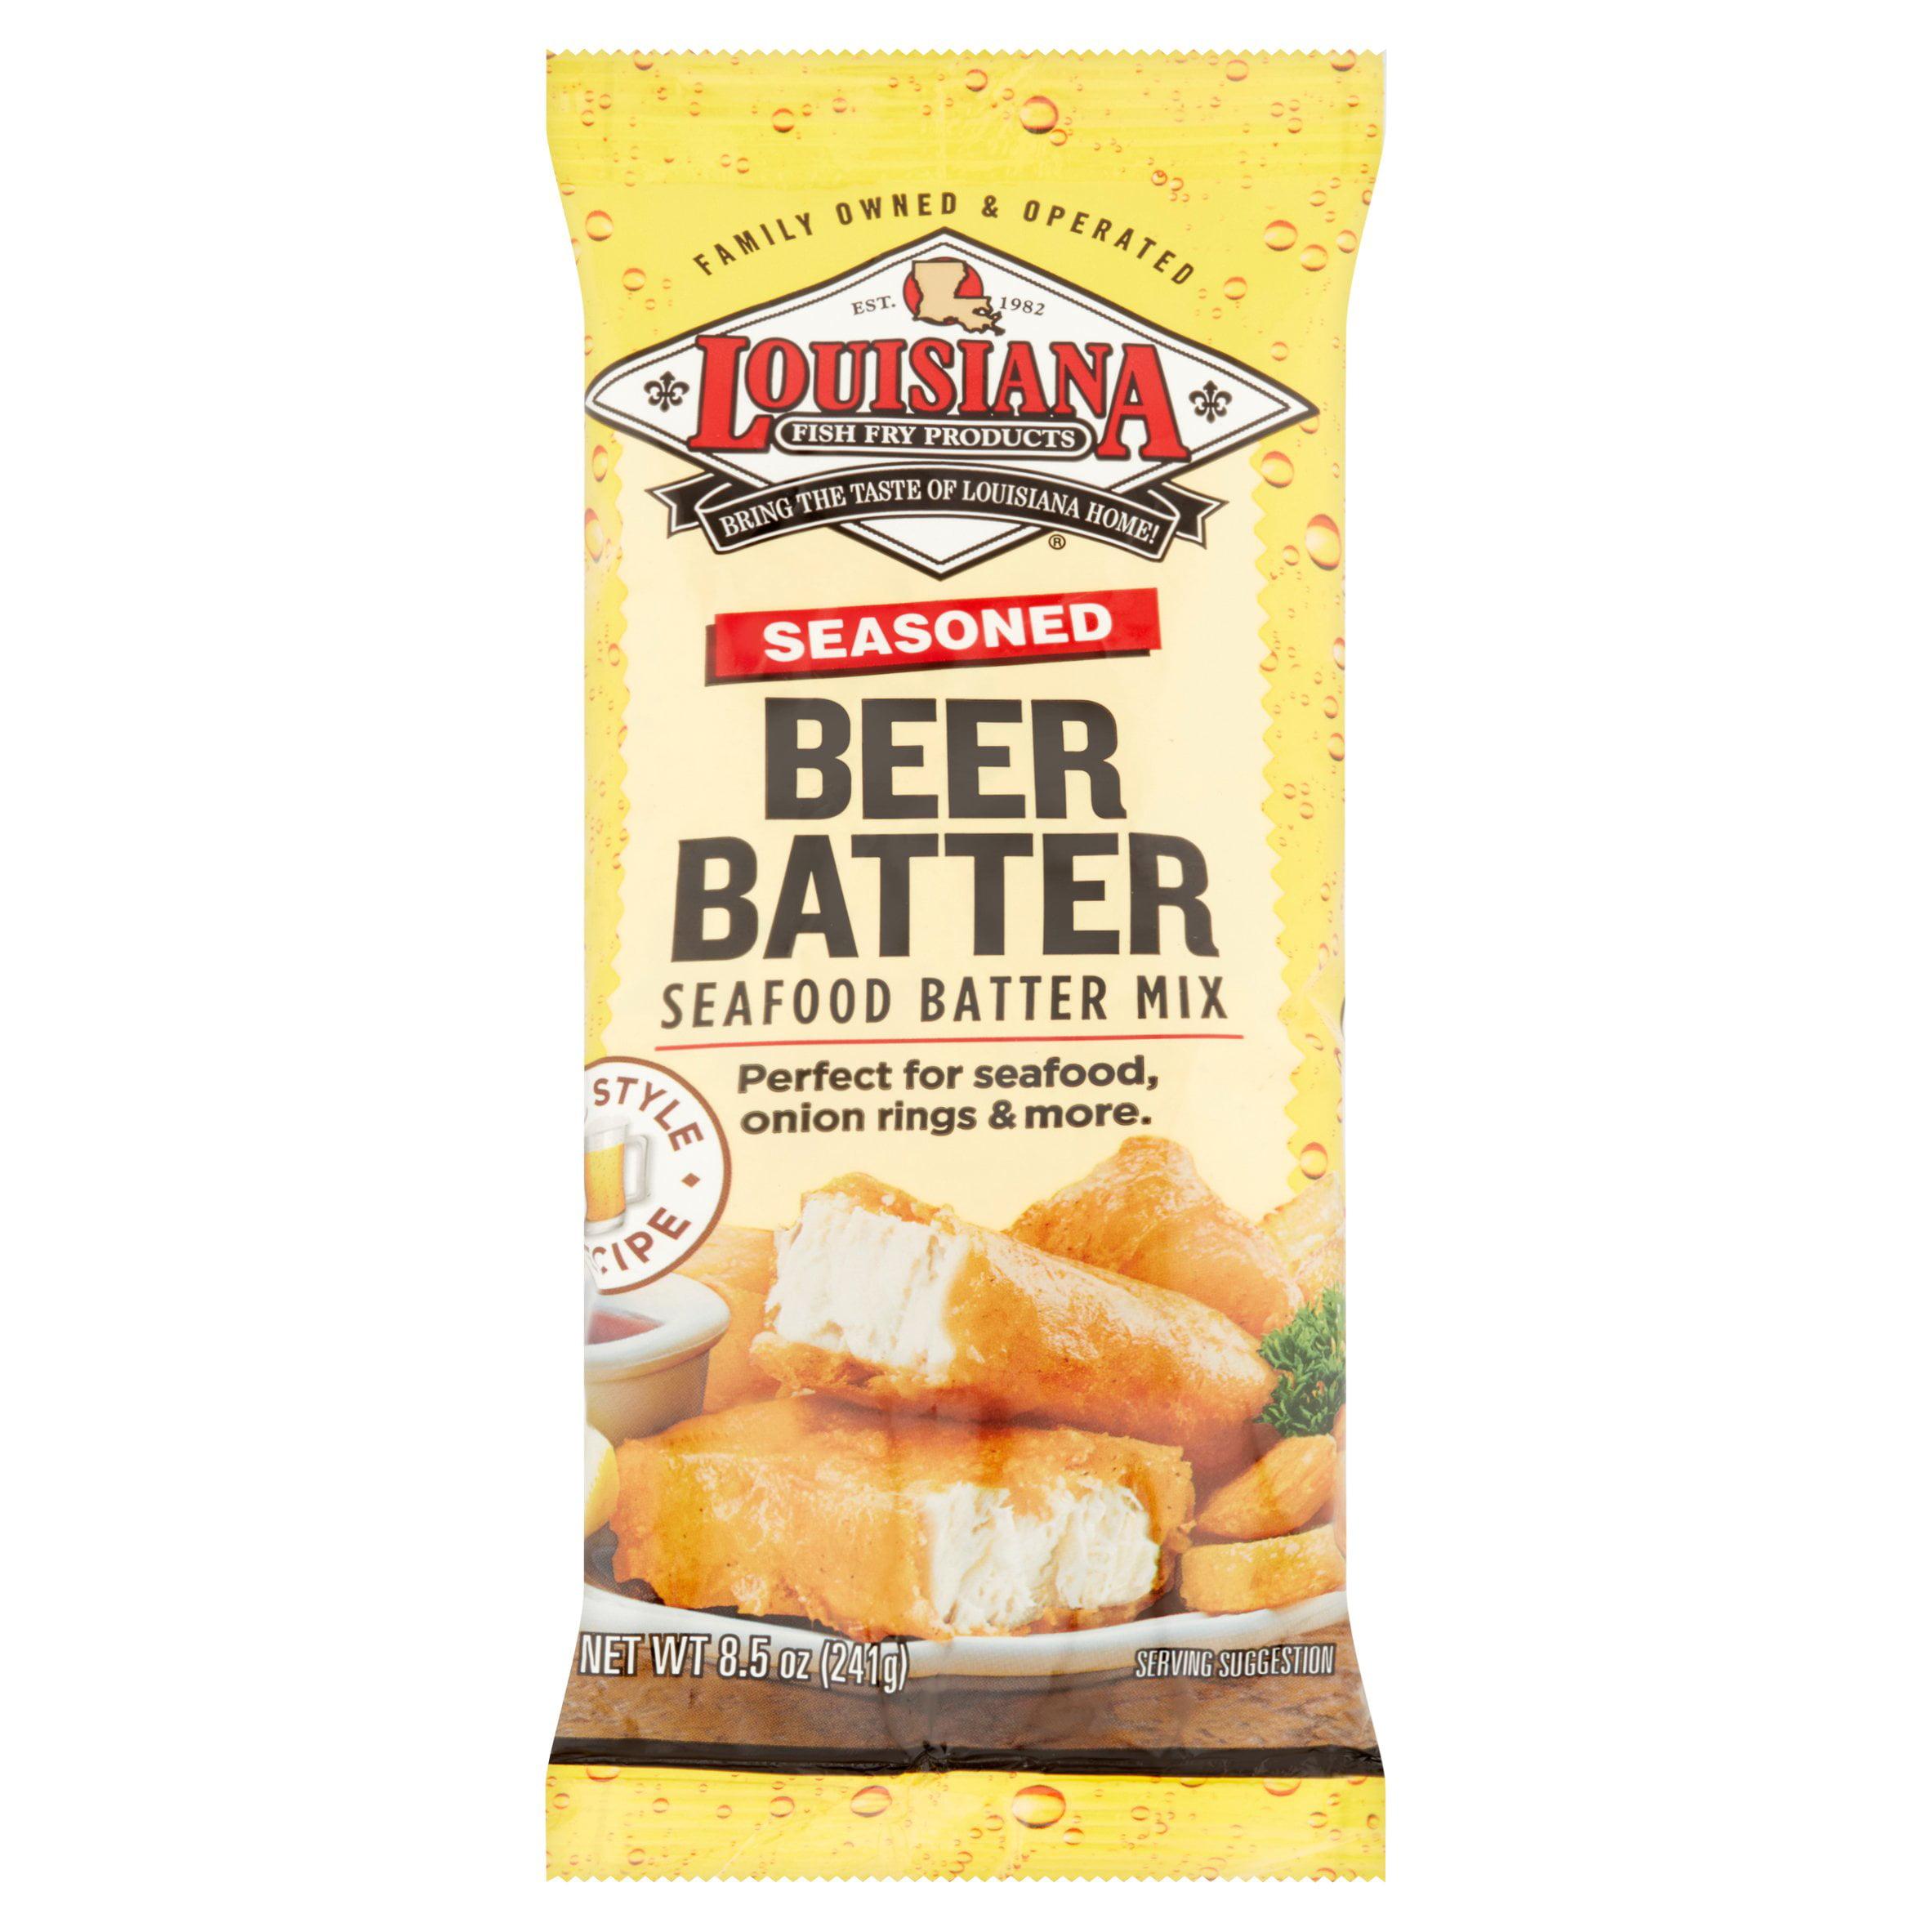 (3 Pack) Louisiana Fish Fry Products Seasoned Beer Batter Mix 8.5oz bag